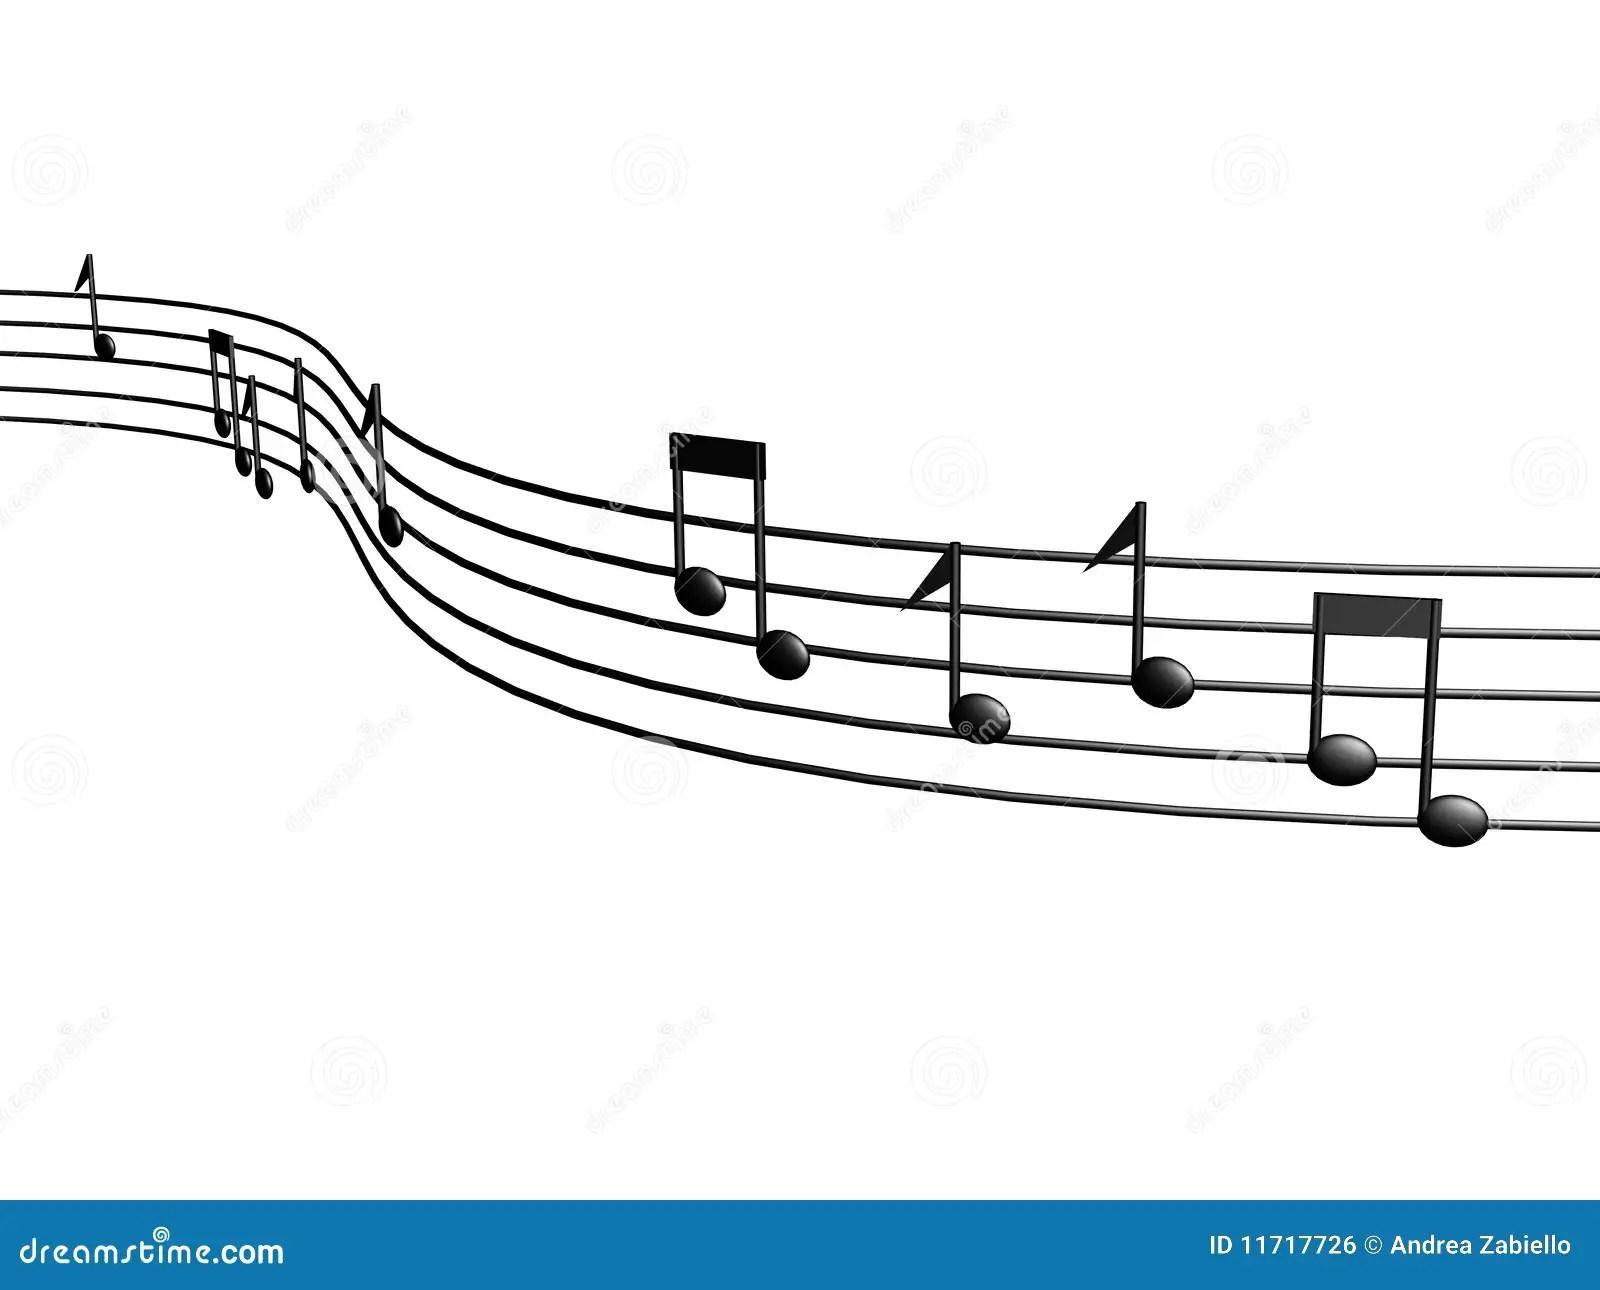 3d music score notes stock illustration. Illustration of